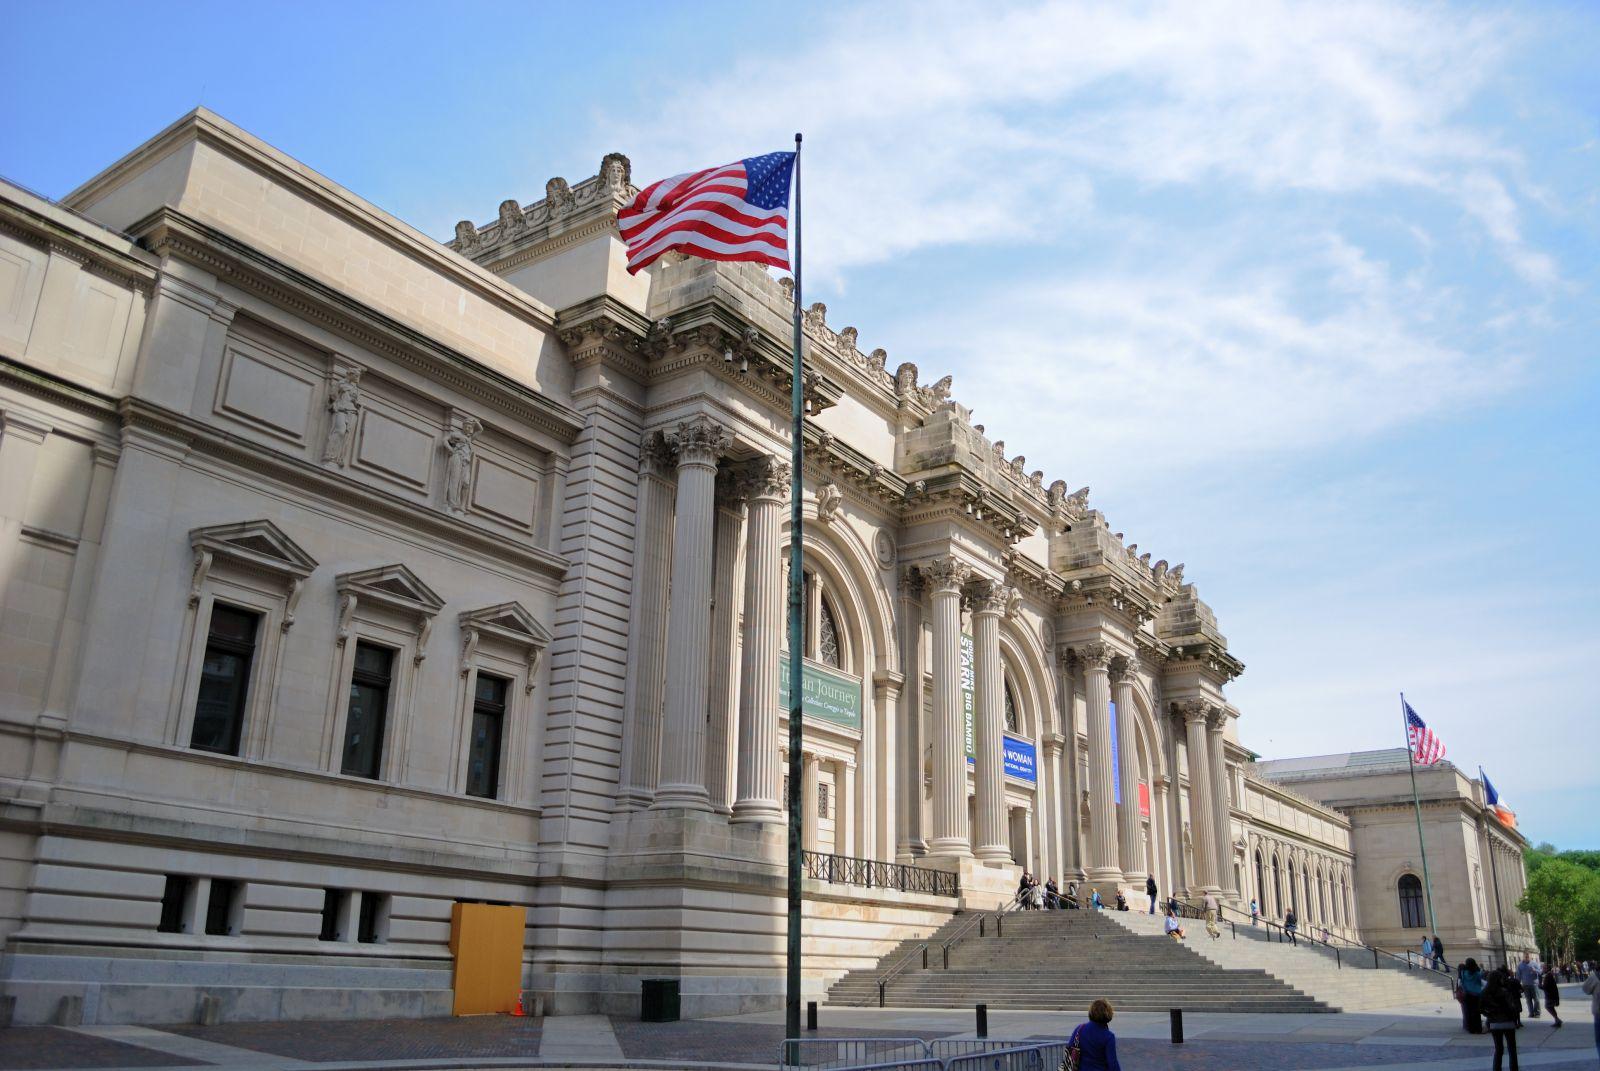 Metropolitan museum of art ab dem 1 m rz kostenpflichtig for Nyc metropolitan museum of art